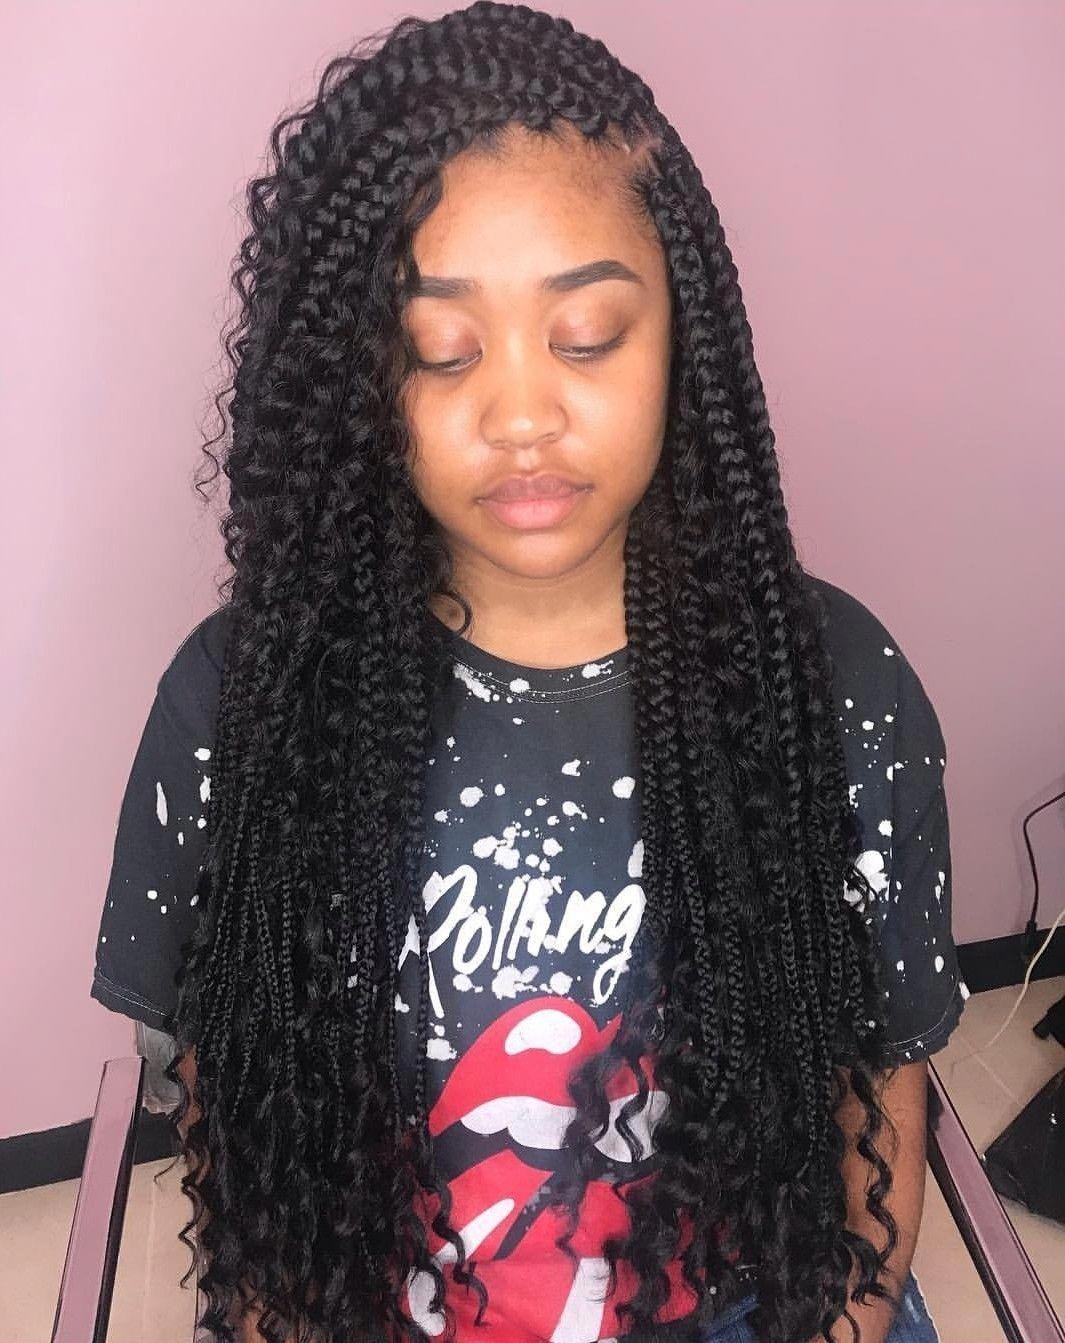 Cyte Pic ғollow Me Datѕnope ғor More Boxbraidsupdo Longboxbraids Goddessbraids Cyte Pic ғol Hair Styles Braids With Curls Box Braids Hairstyles